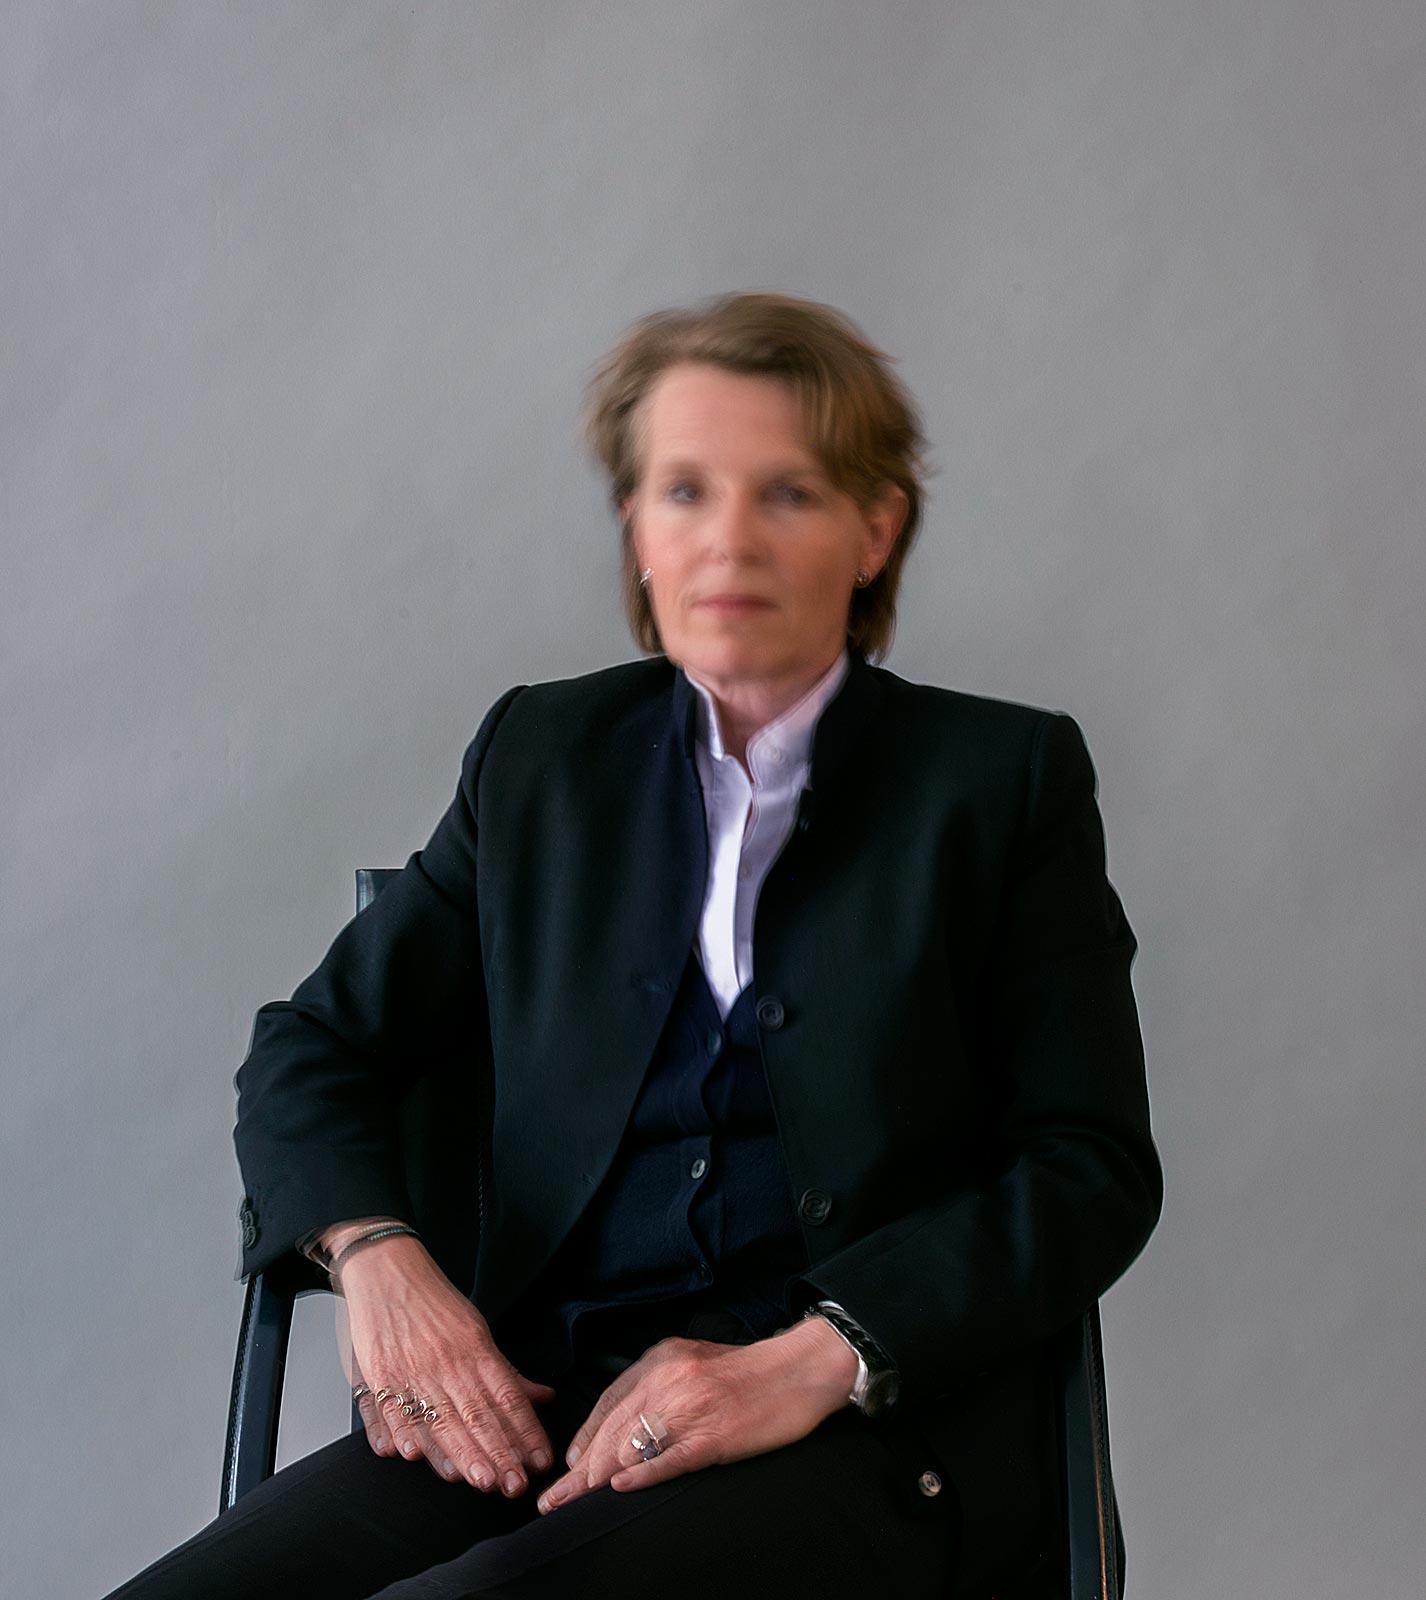 Annabelle Selldorf (17.53 - 17.58 Uhr, 27.4.2017)